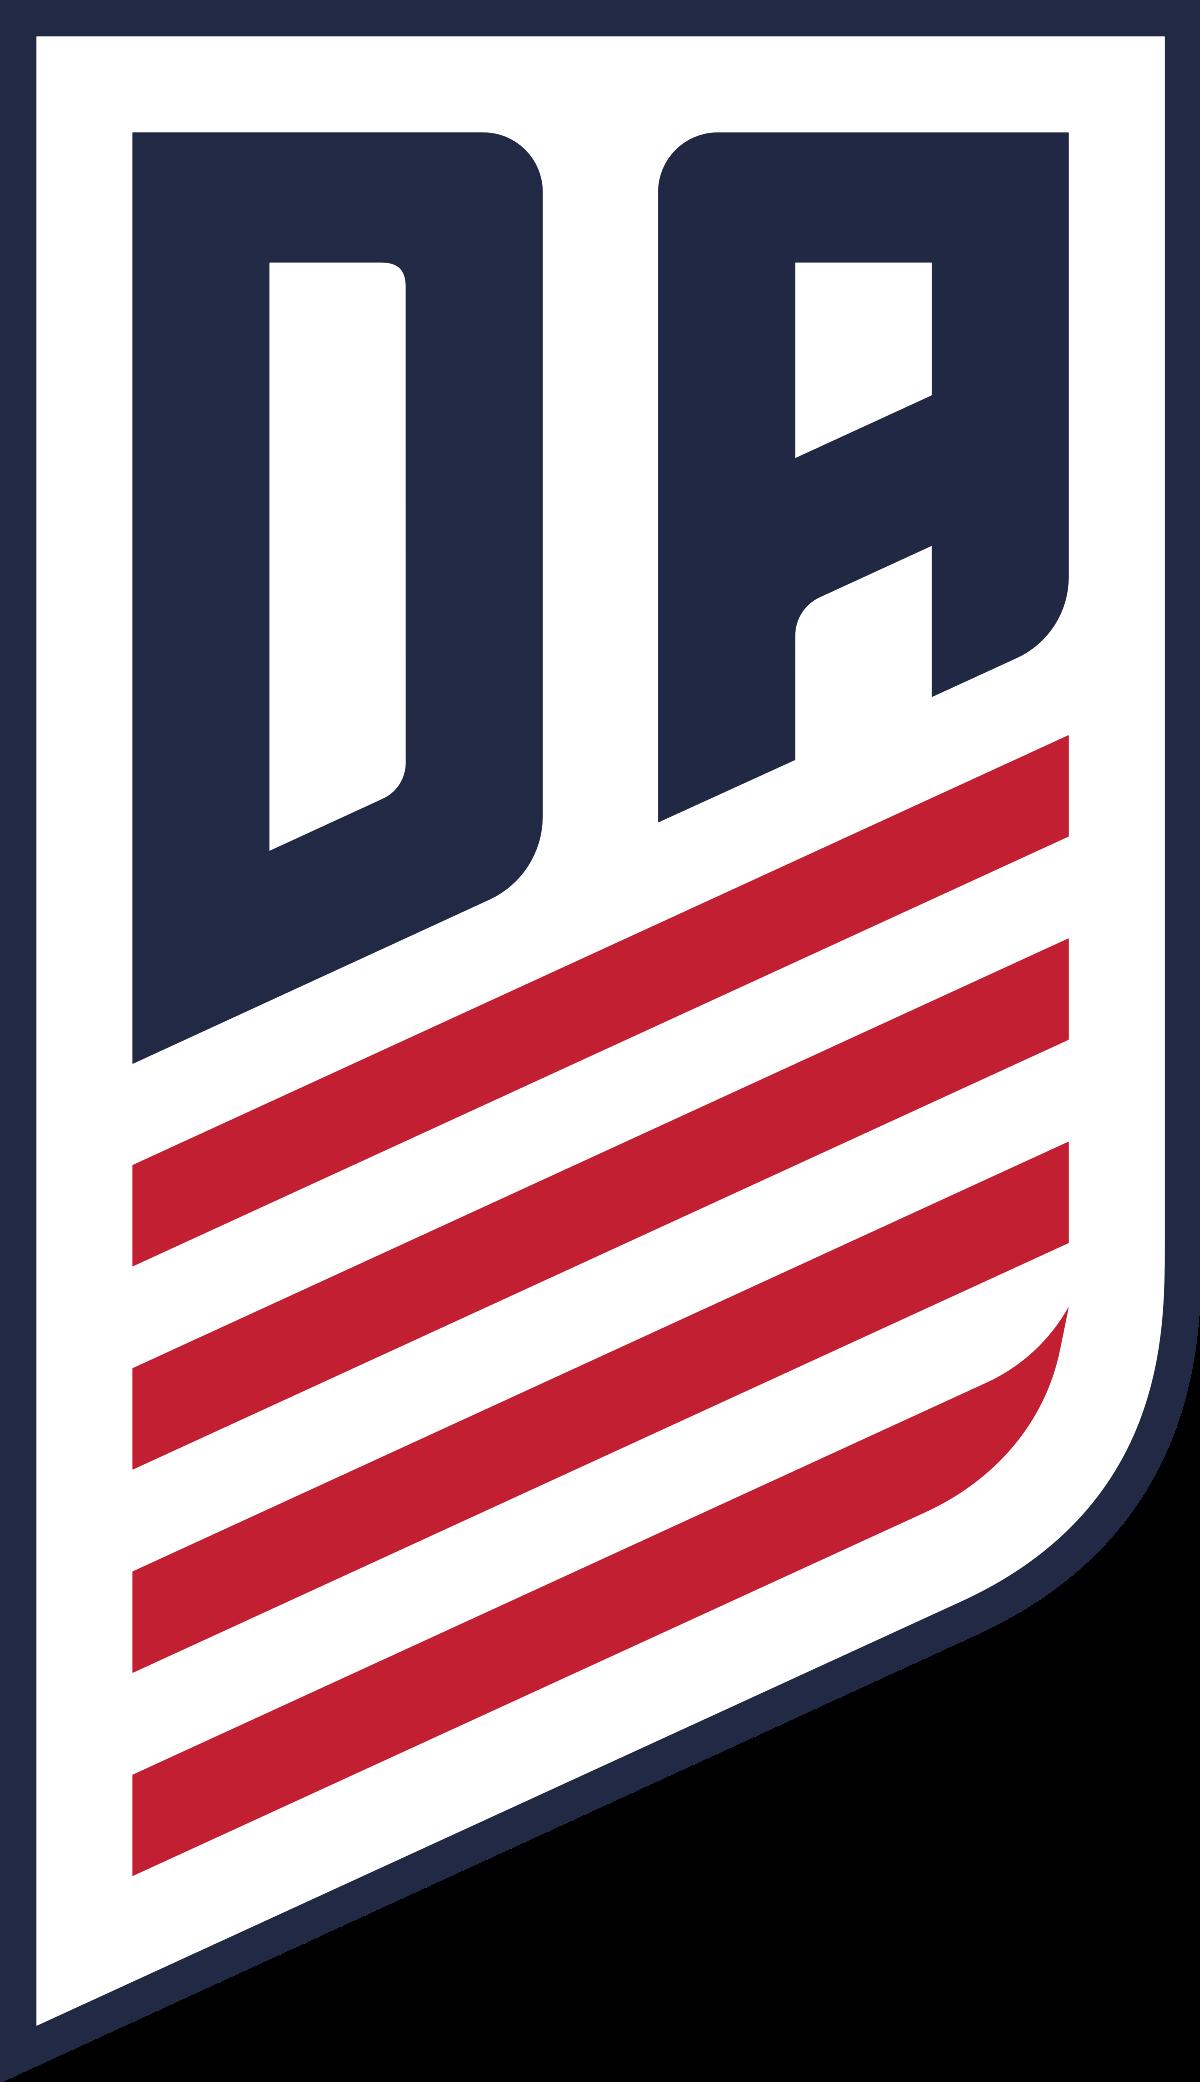 U.S. Soccer Development Academy.